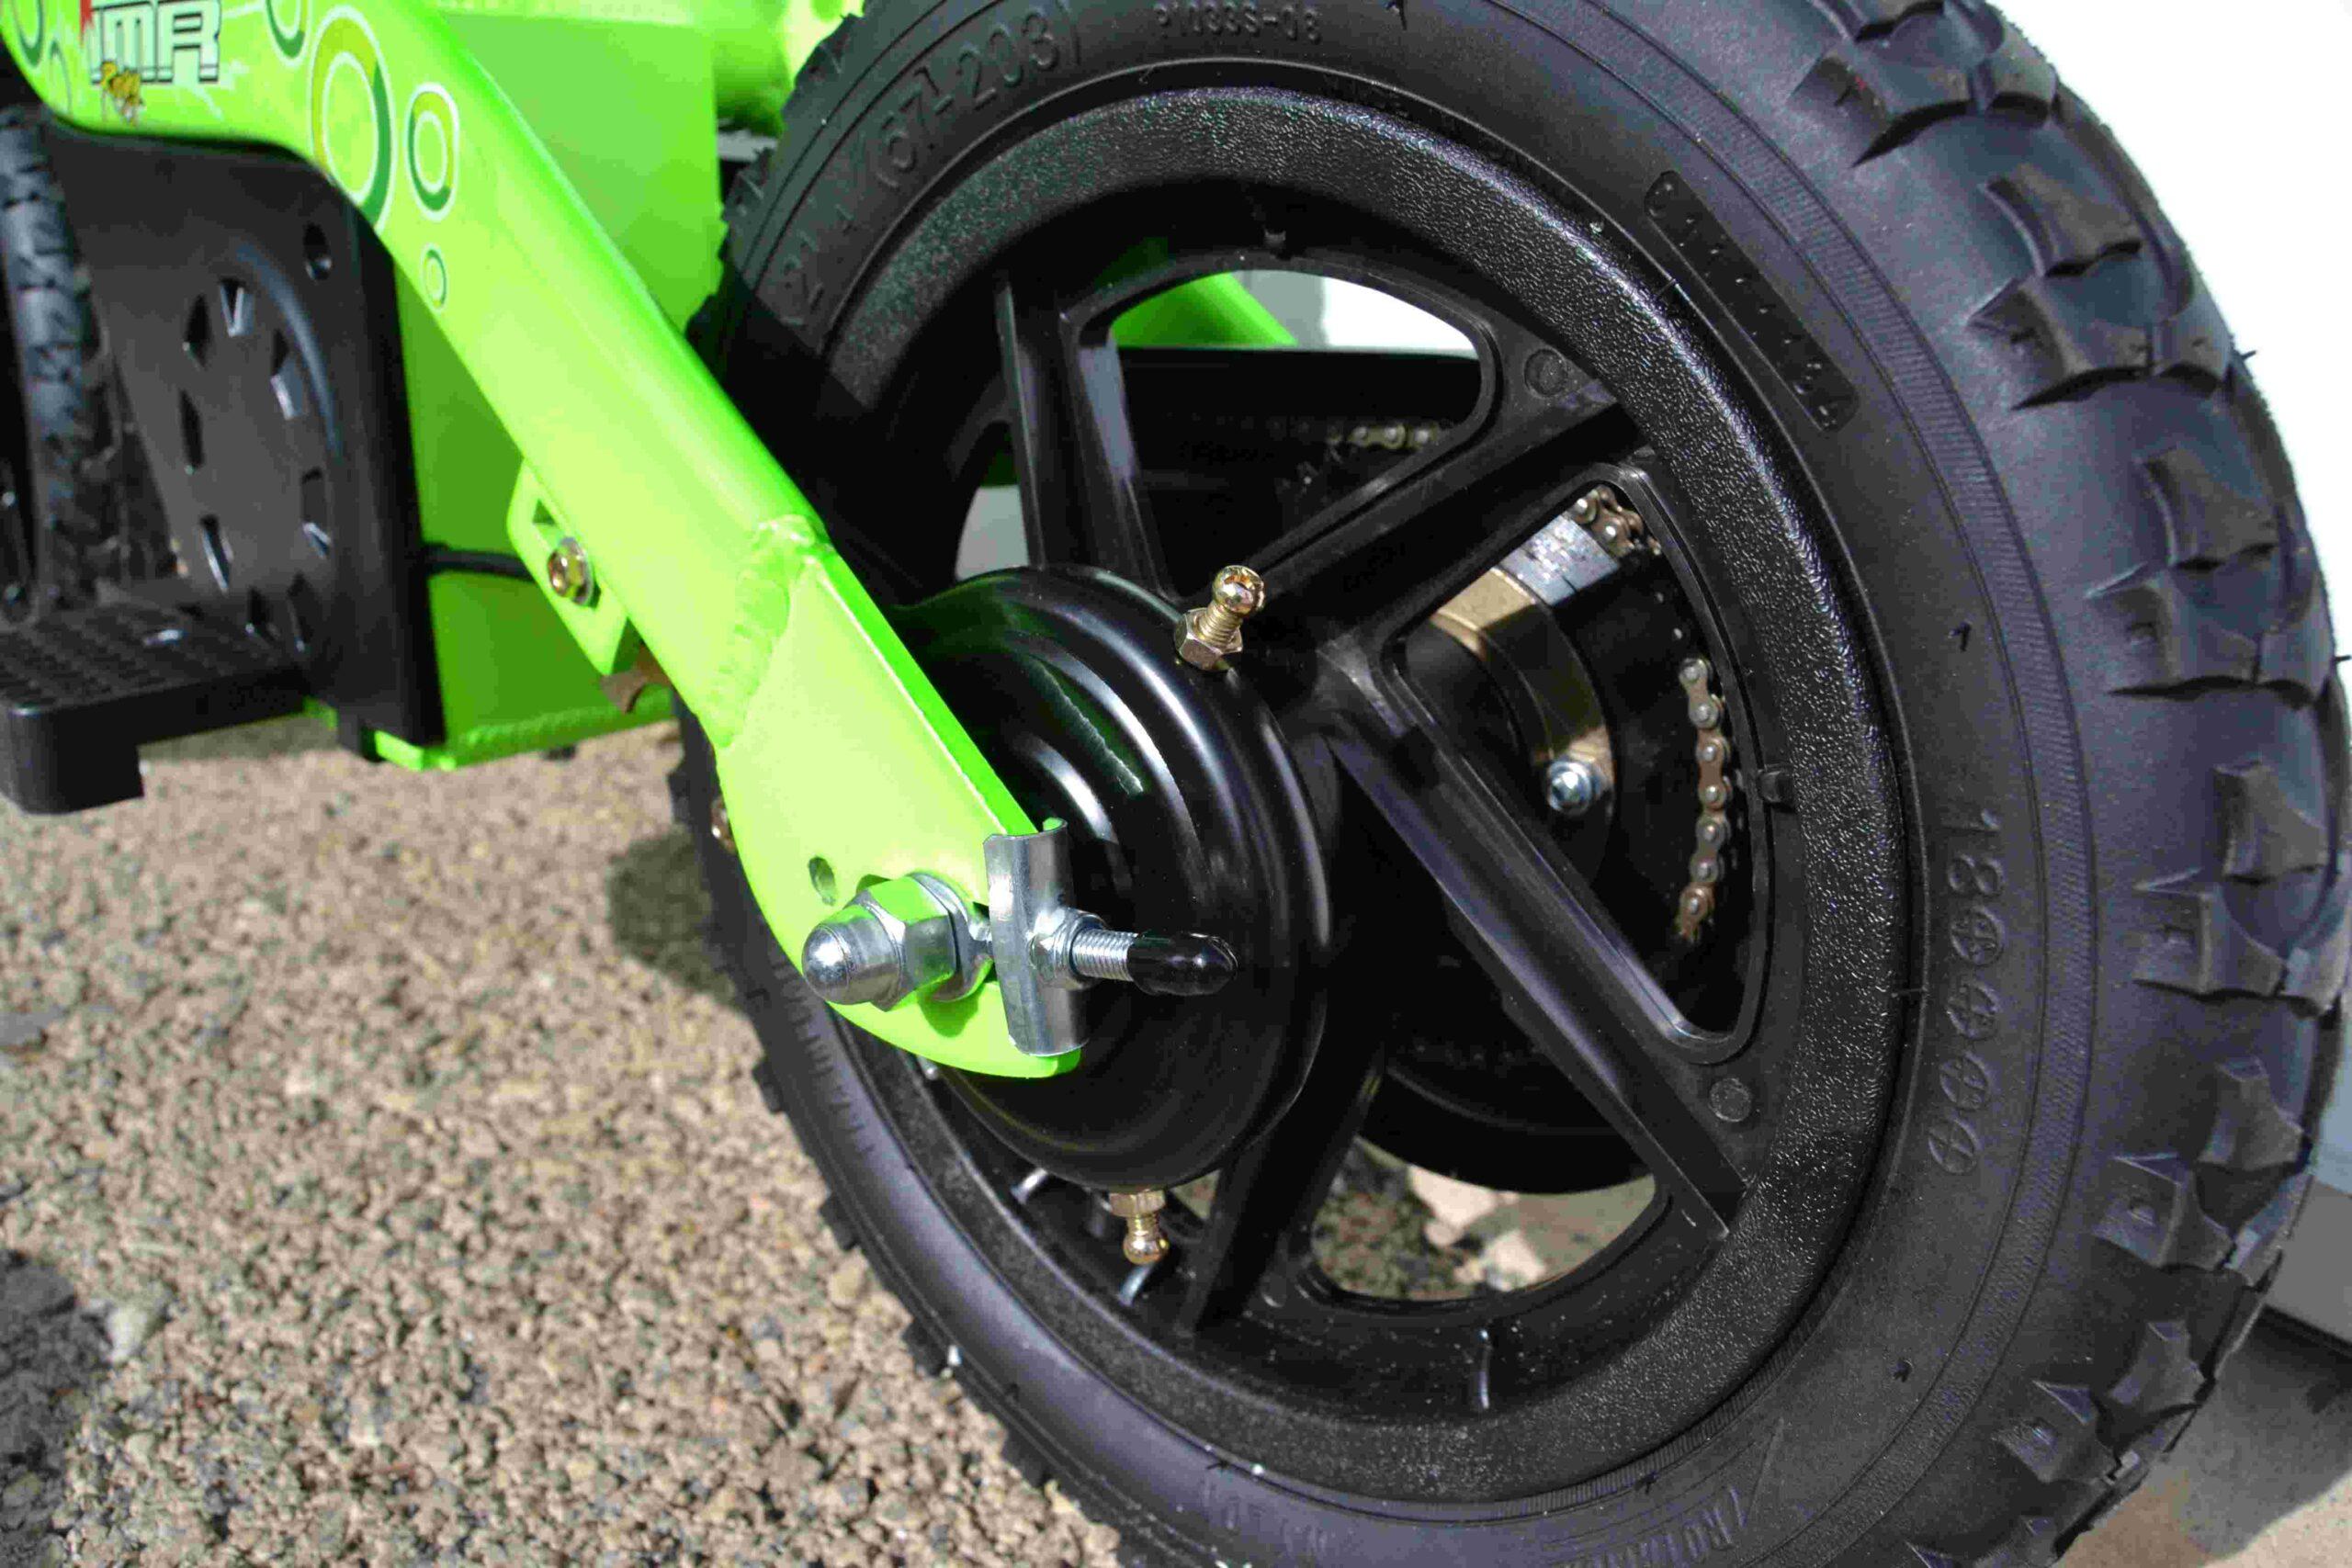 Bici20electrica20verde205-2.jpg